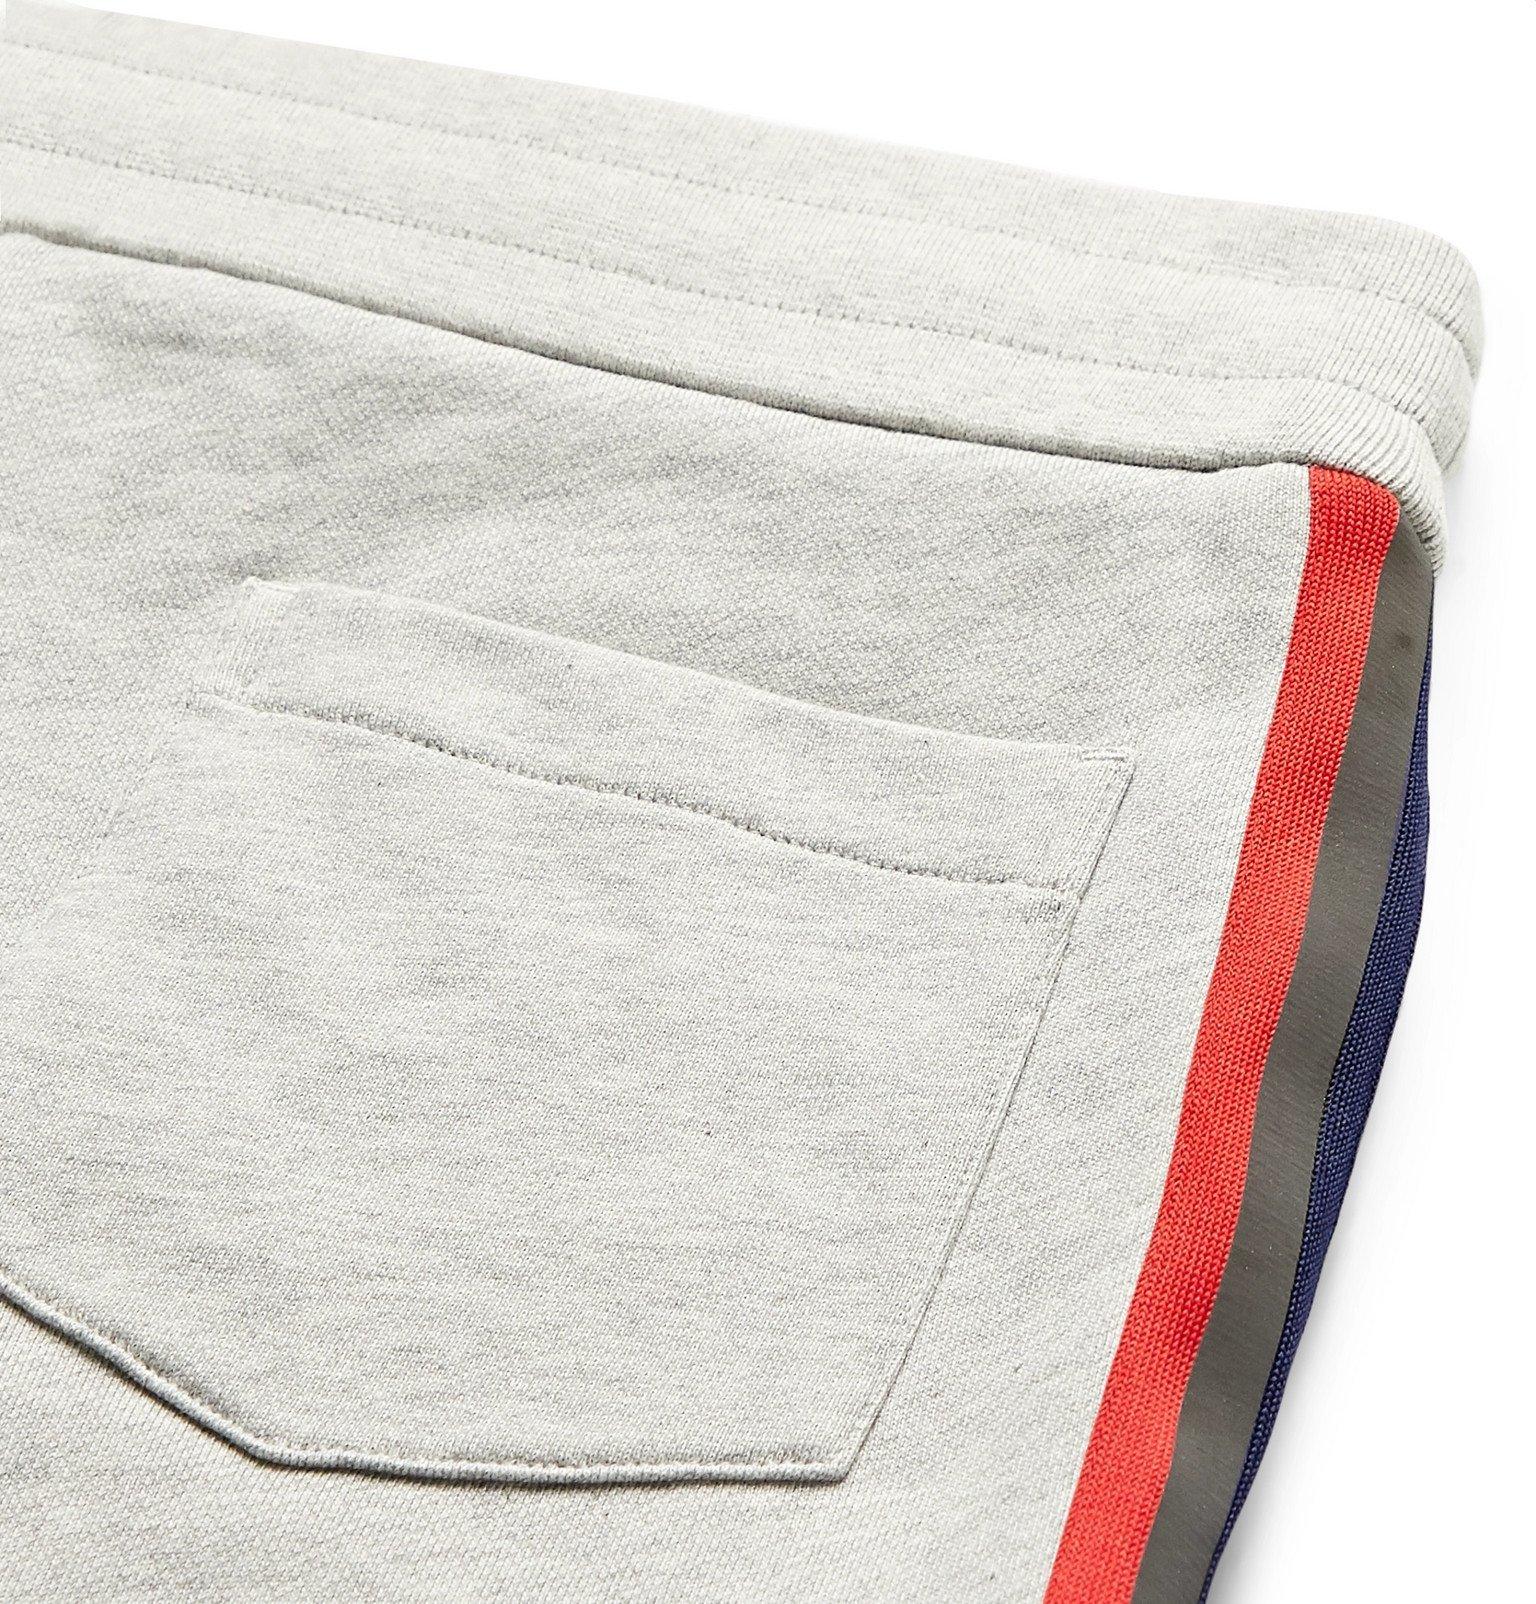 Moncler - Logo-Appliquéd Webbing-Trimmed Loopback Cotton-Jersey Shorts - Gray